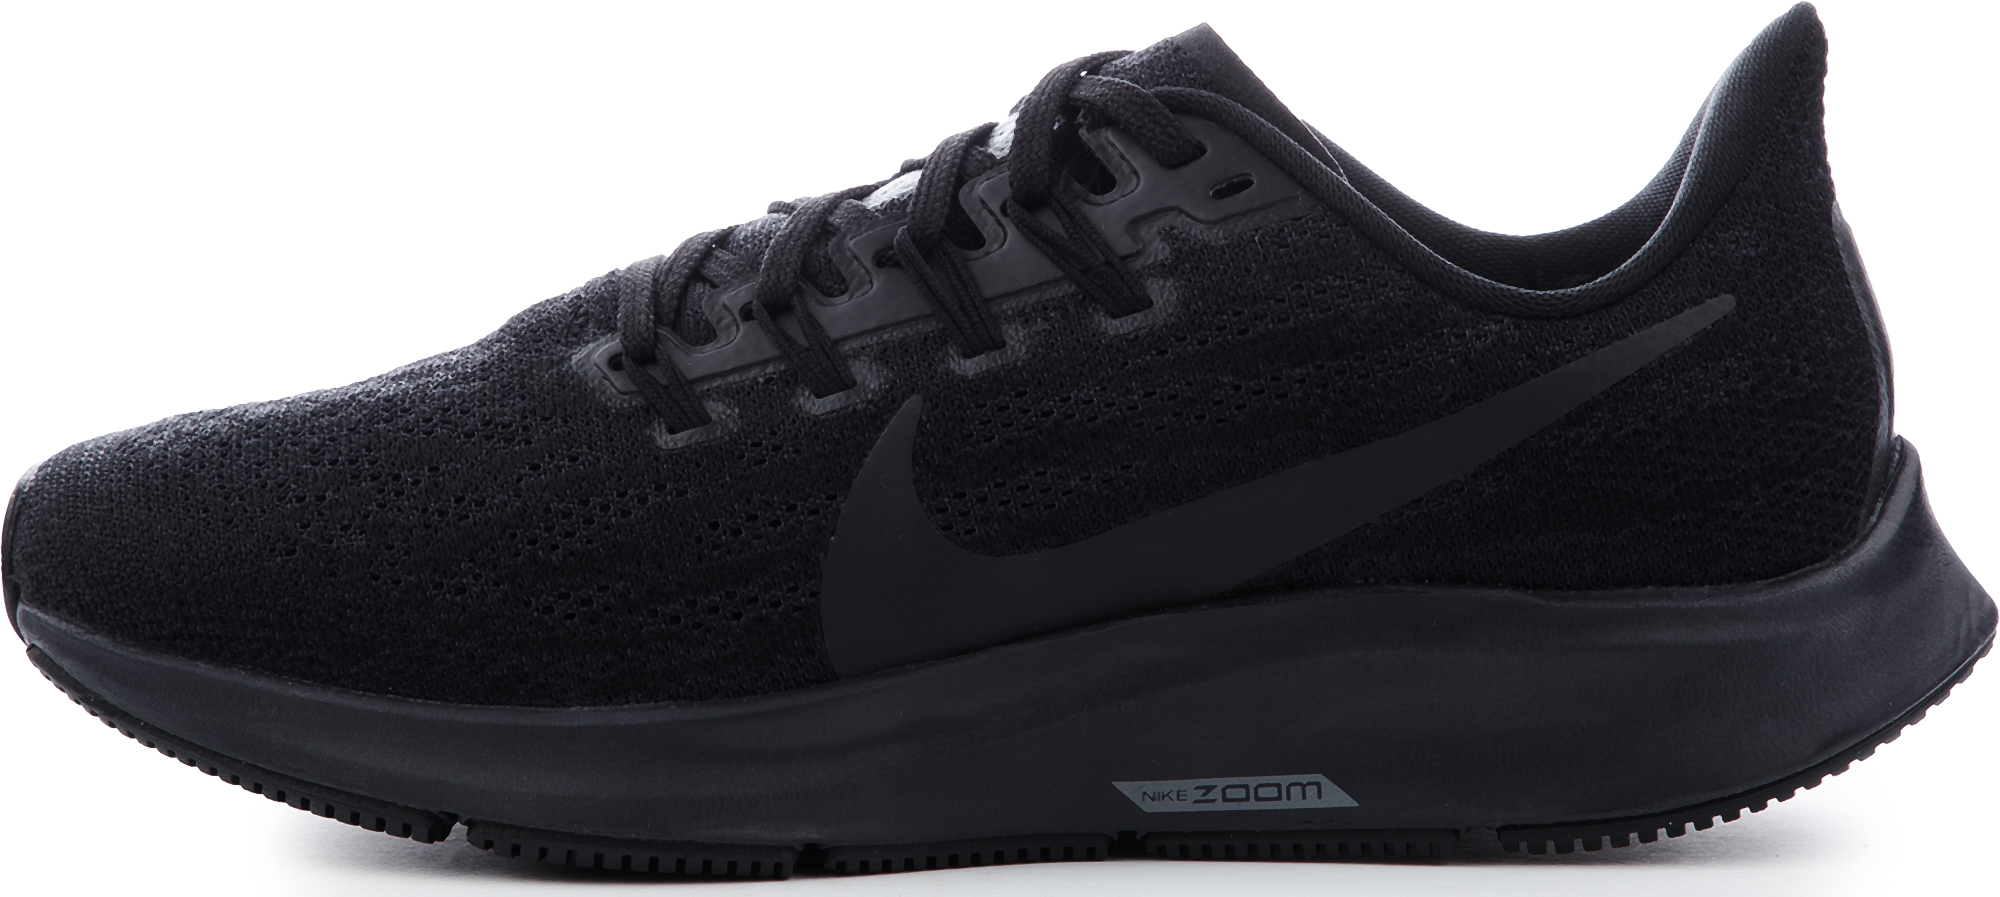 Фото - Nike Кроссовки женские Nike Air Zoom Pegasus 36, размер 39 кроссовки nike sb zoom stefan janoski